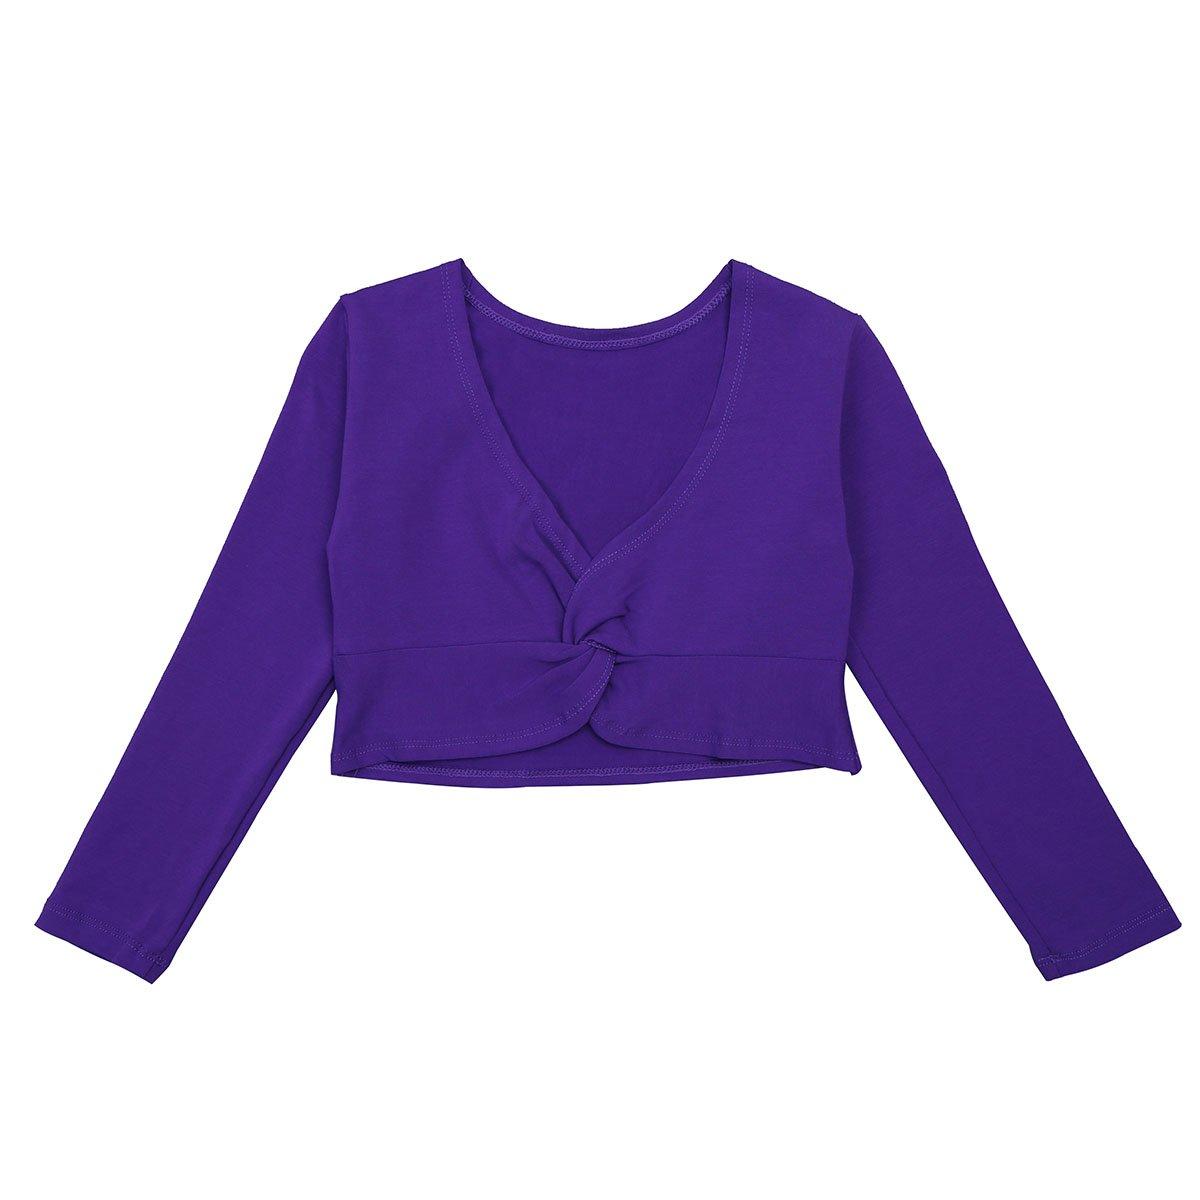 iEFiEL Girls Front Twist Knot Long Sleeve Ballerina Dance Cotton Wrap Top Purple 5-6